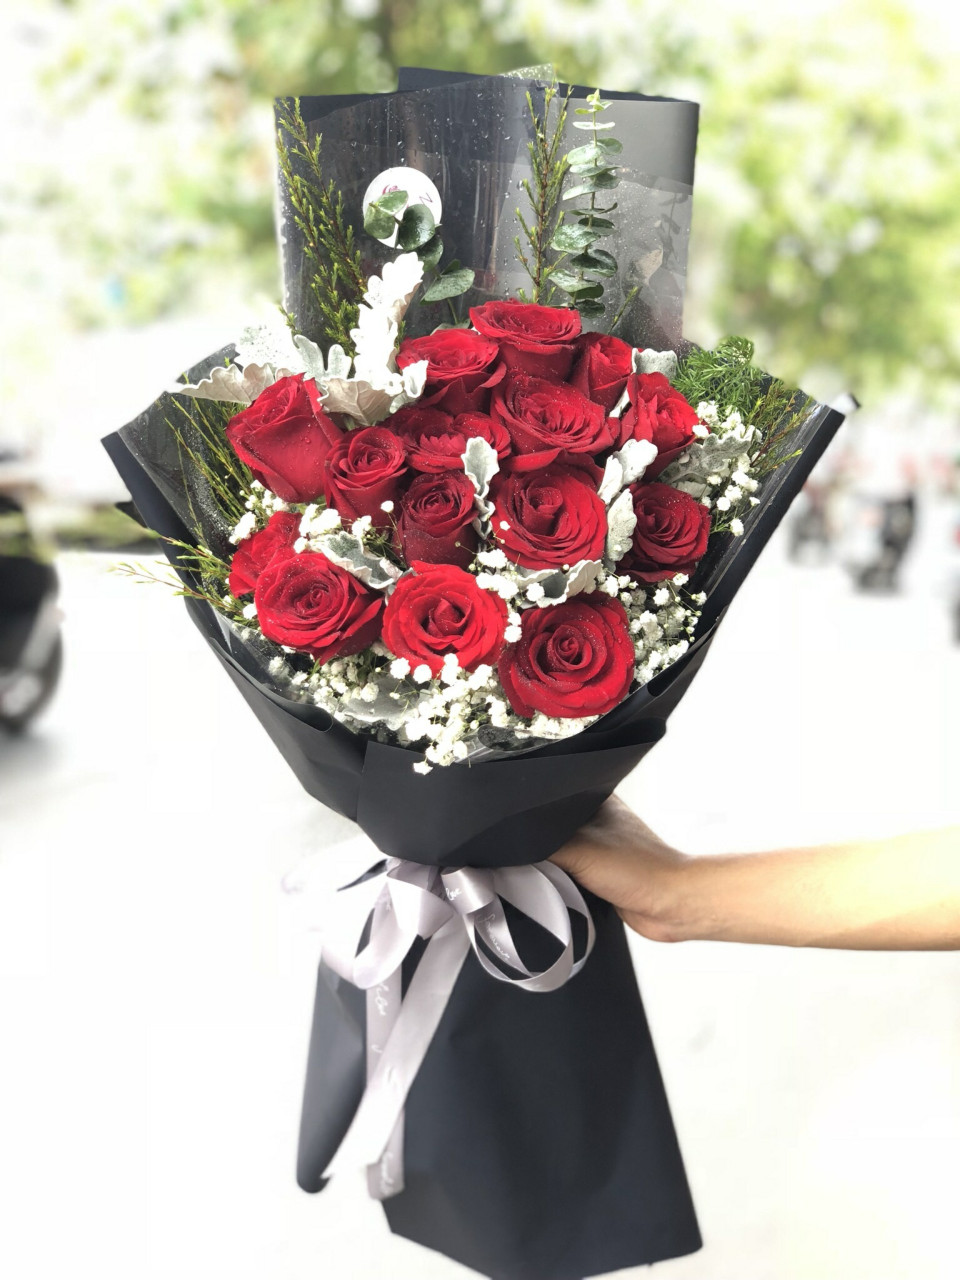 Bó hoa hồng đỏ nhập Ecuador